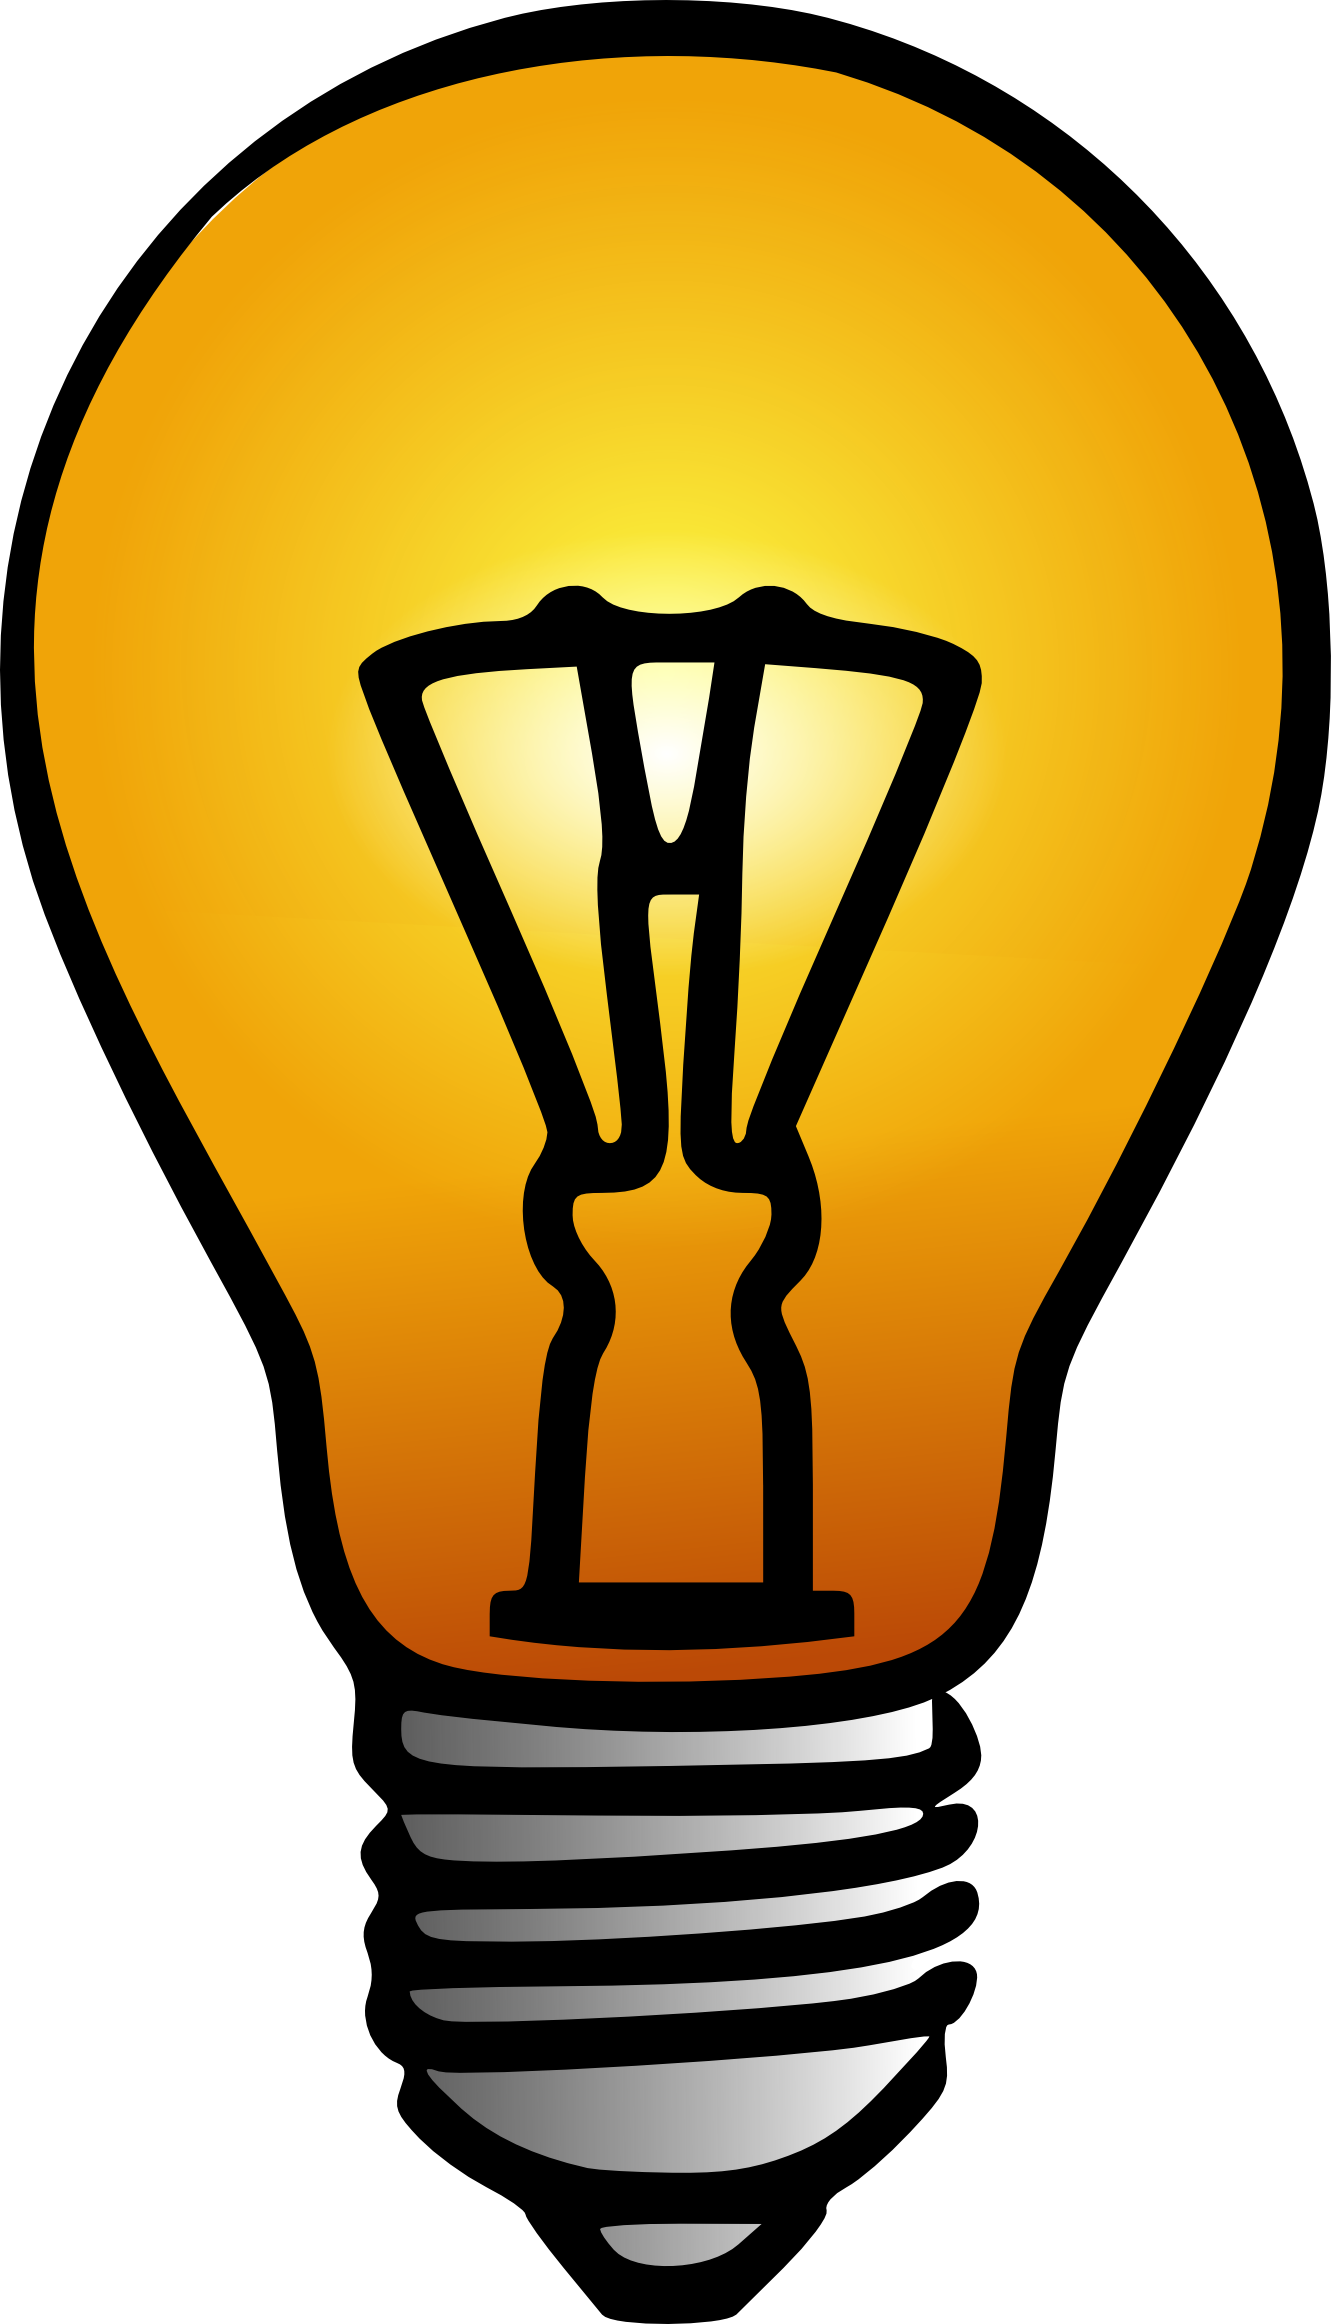 lightbulb clipart png clipart panda free clipart images light bulb clip art image free light bulb clipart png